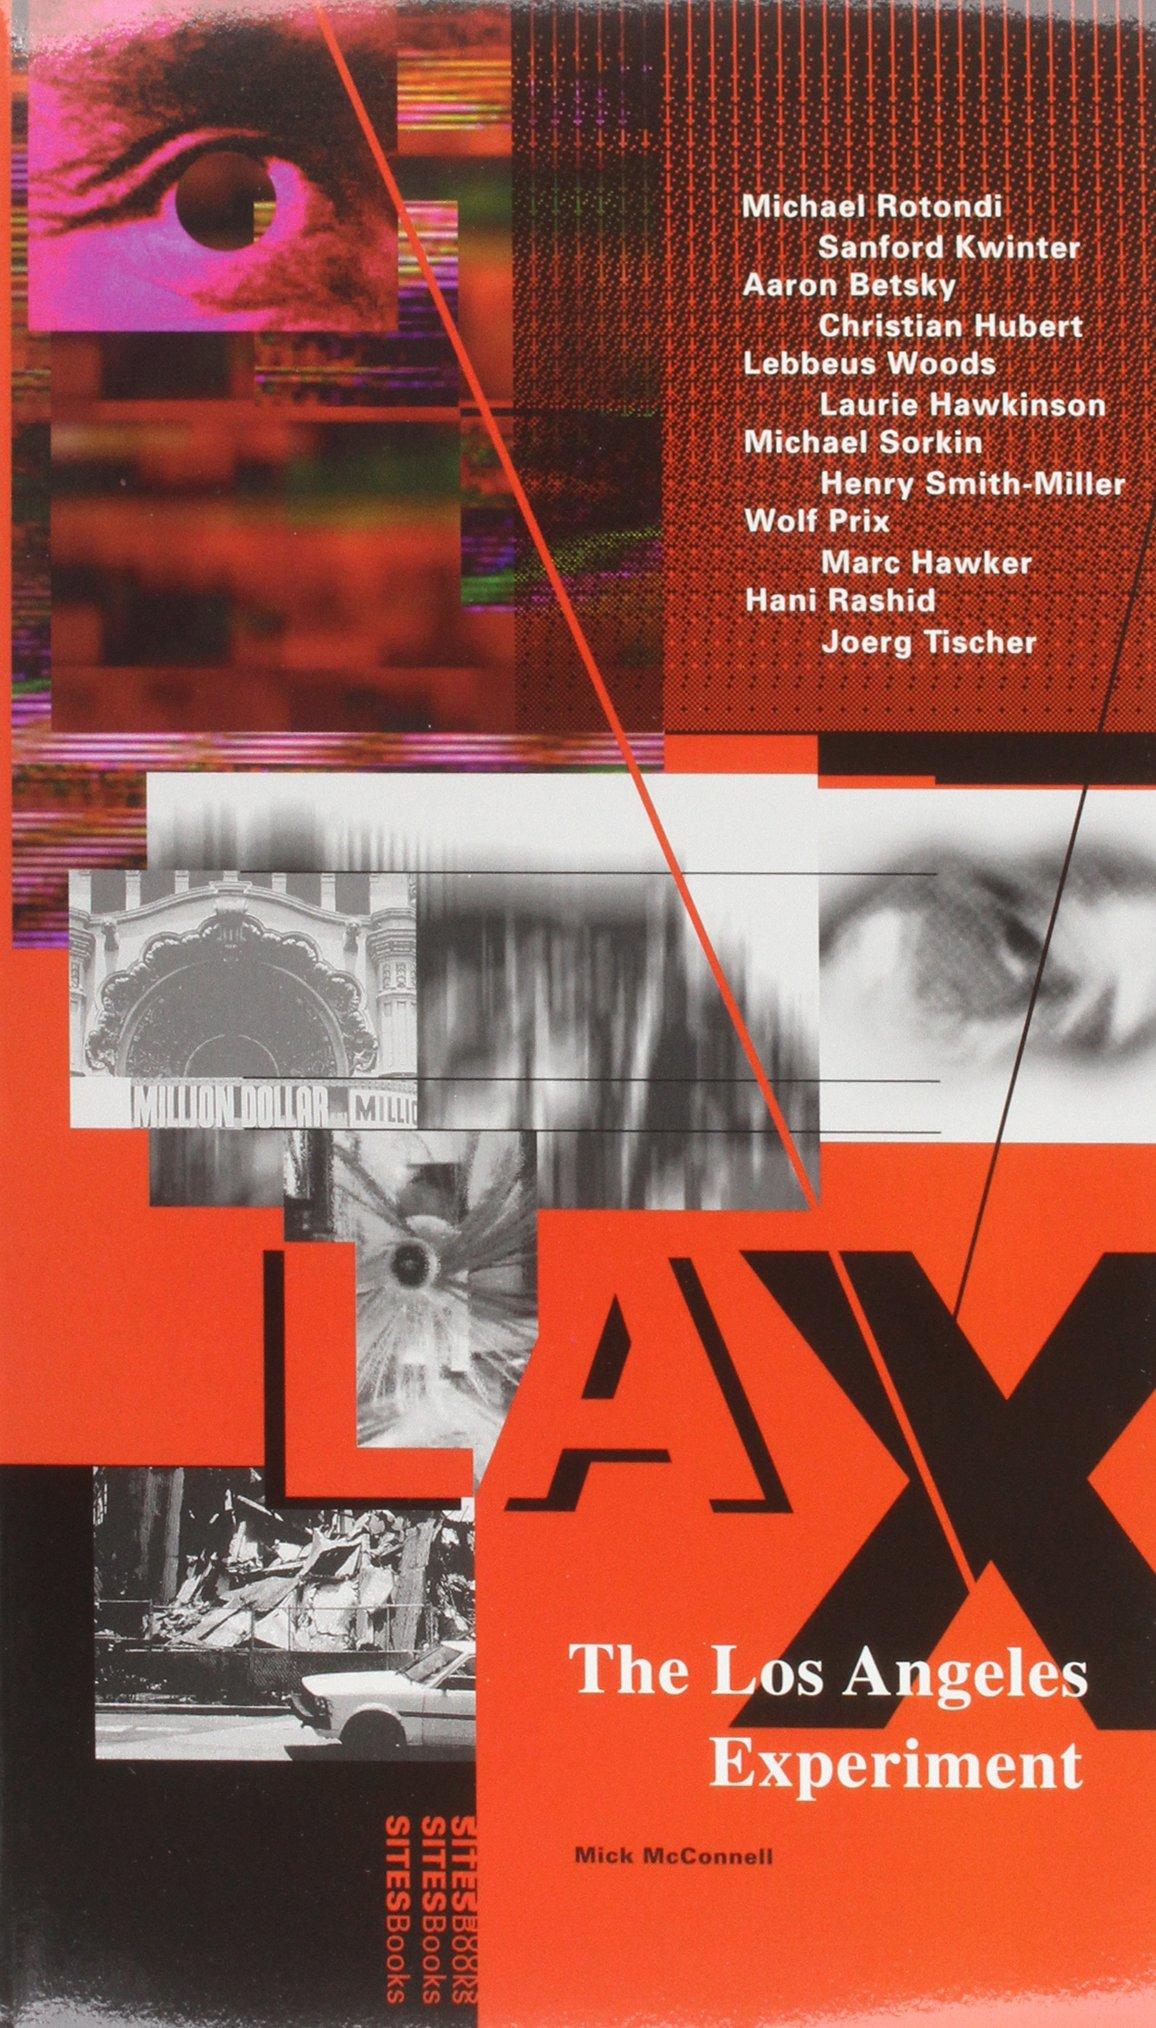 Lax: The Los Angeles Experiment: Architecture/Design: Amazon ...